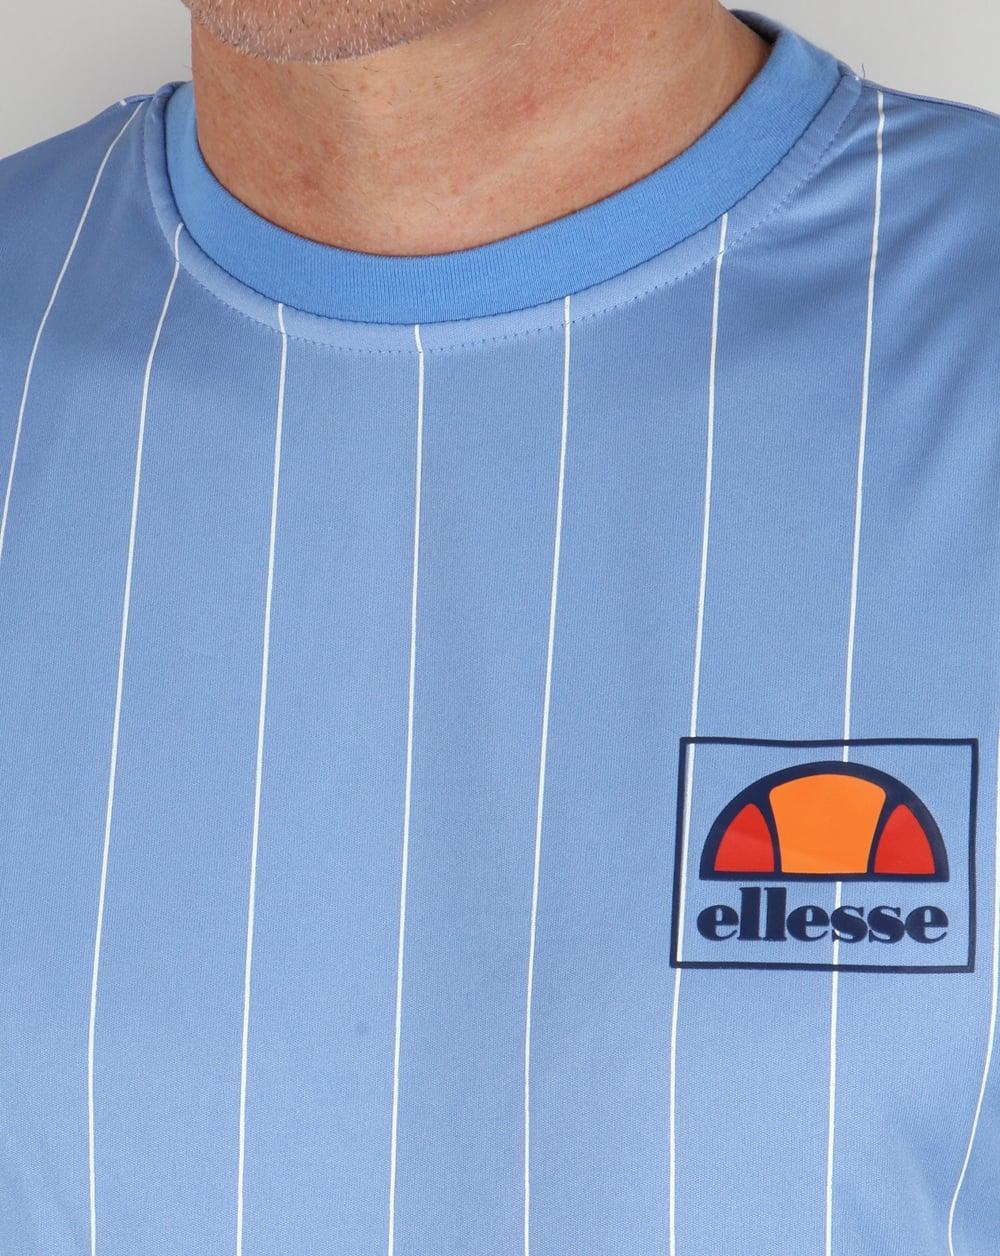 ellesse salento striped t shirt sky blue football tee mens crew neck. Black Bedroom Furniture Sets. Home Design Ideas